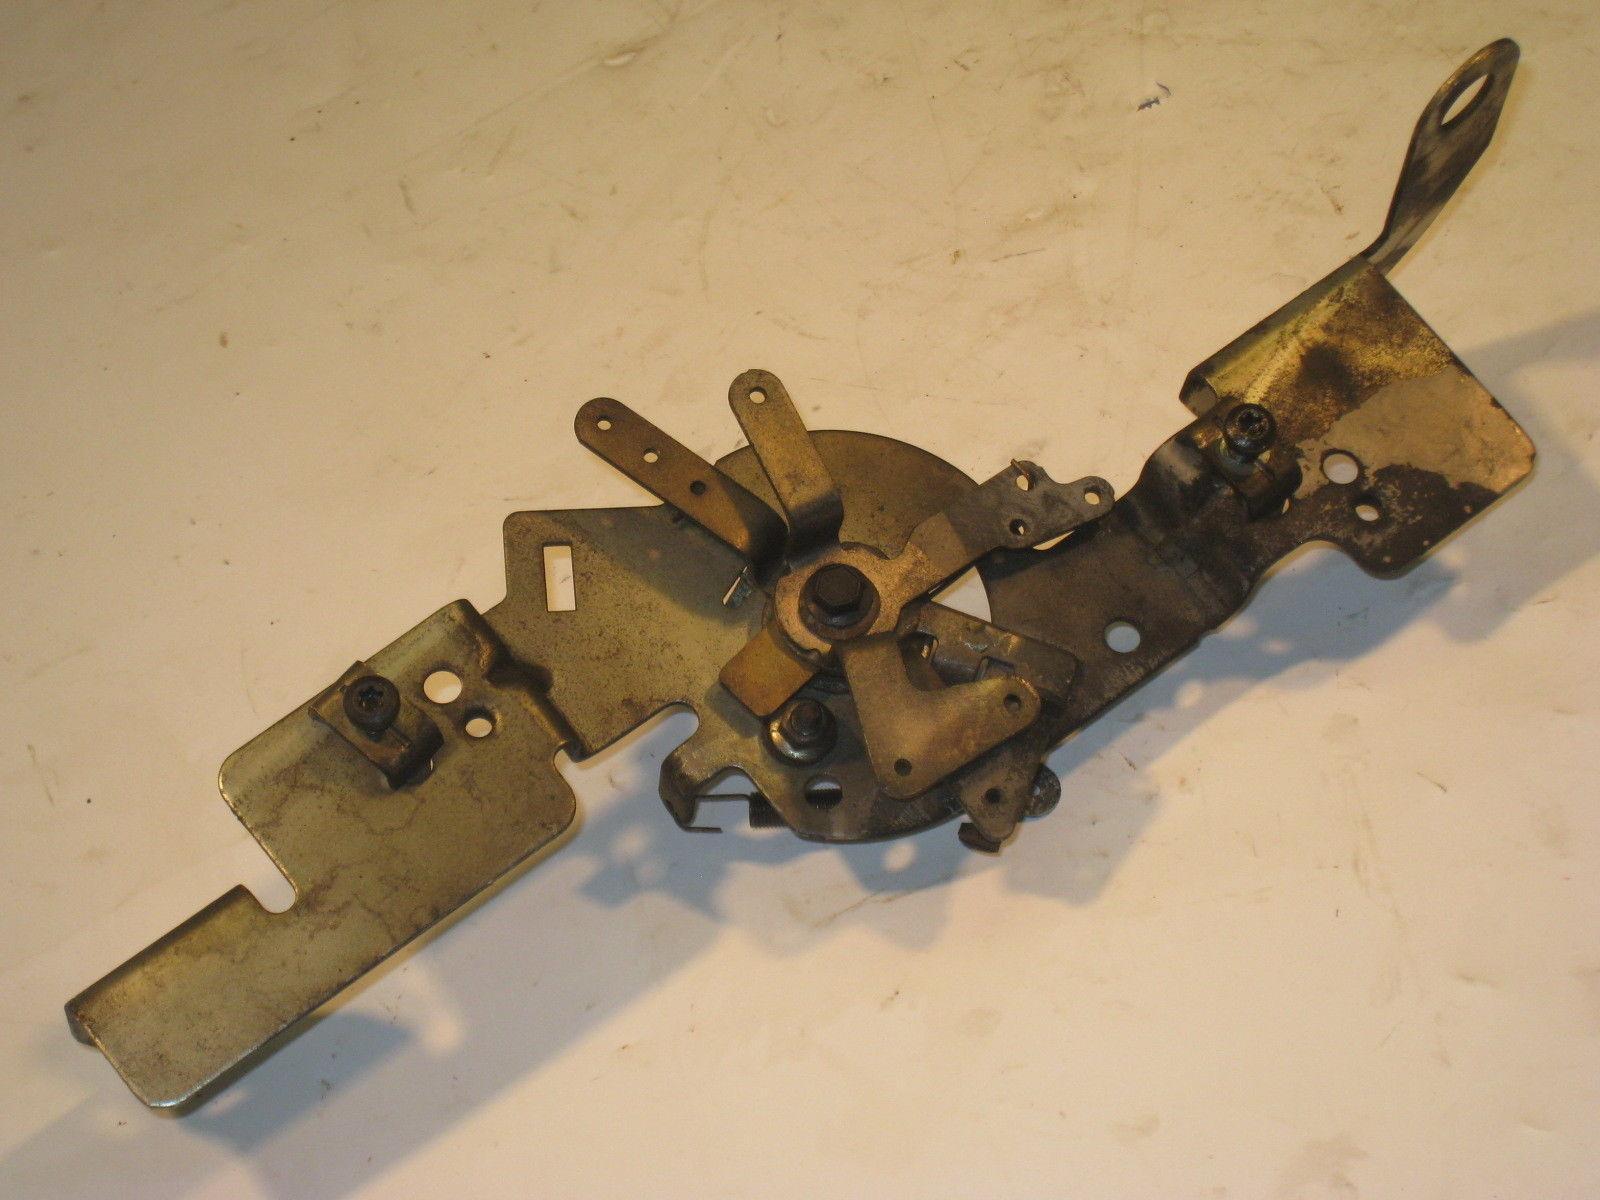 craftsman kohler 23hp cv674 engine throttle speed control bracket 24